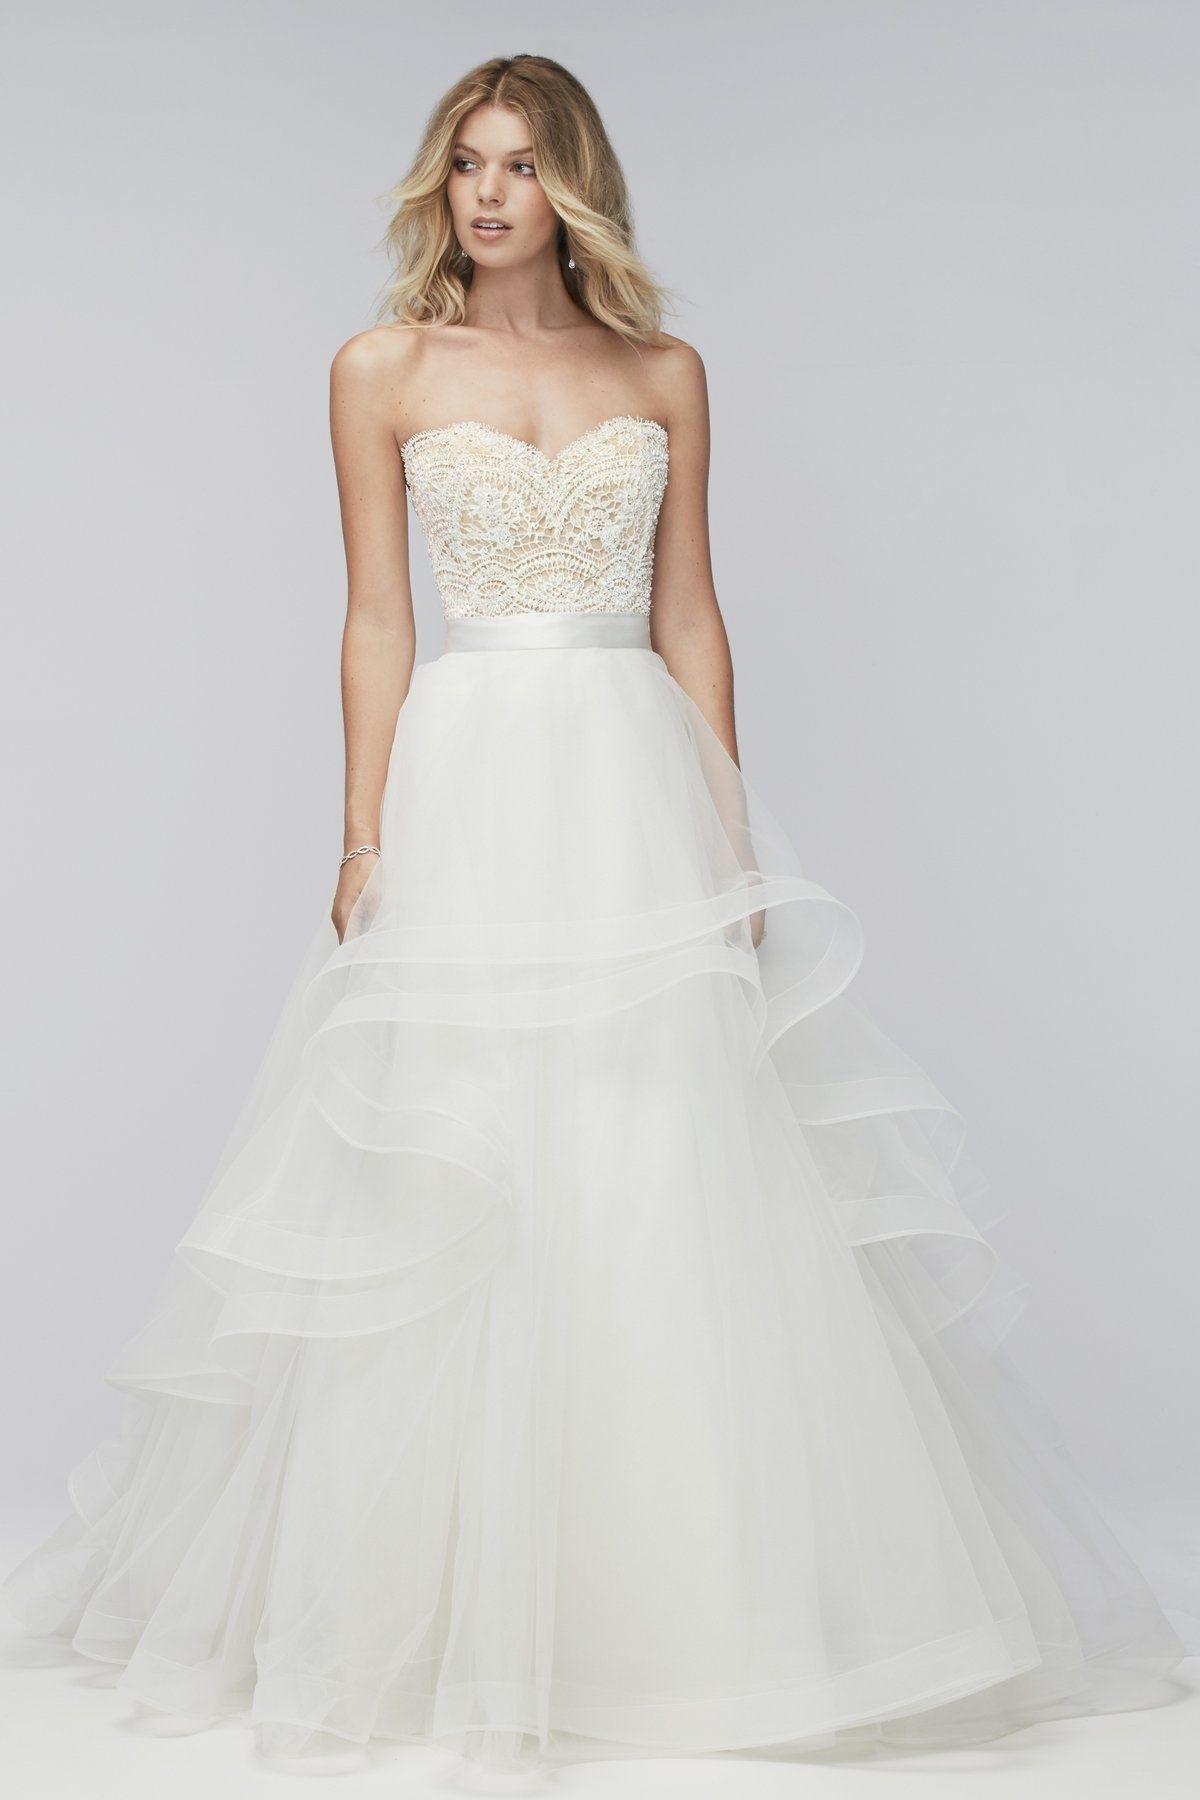 Almira skirt designer bridal gowns watters wedding